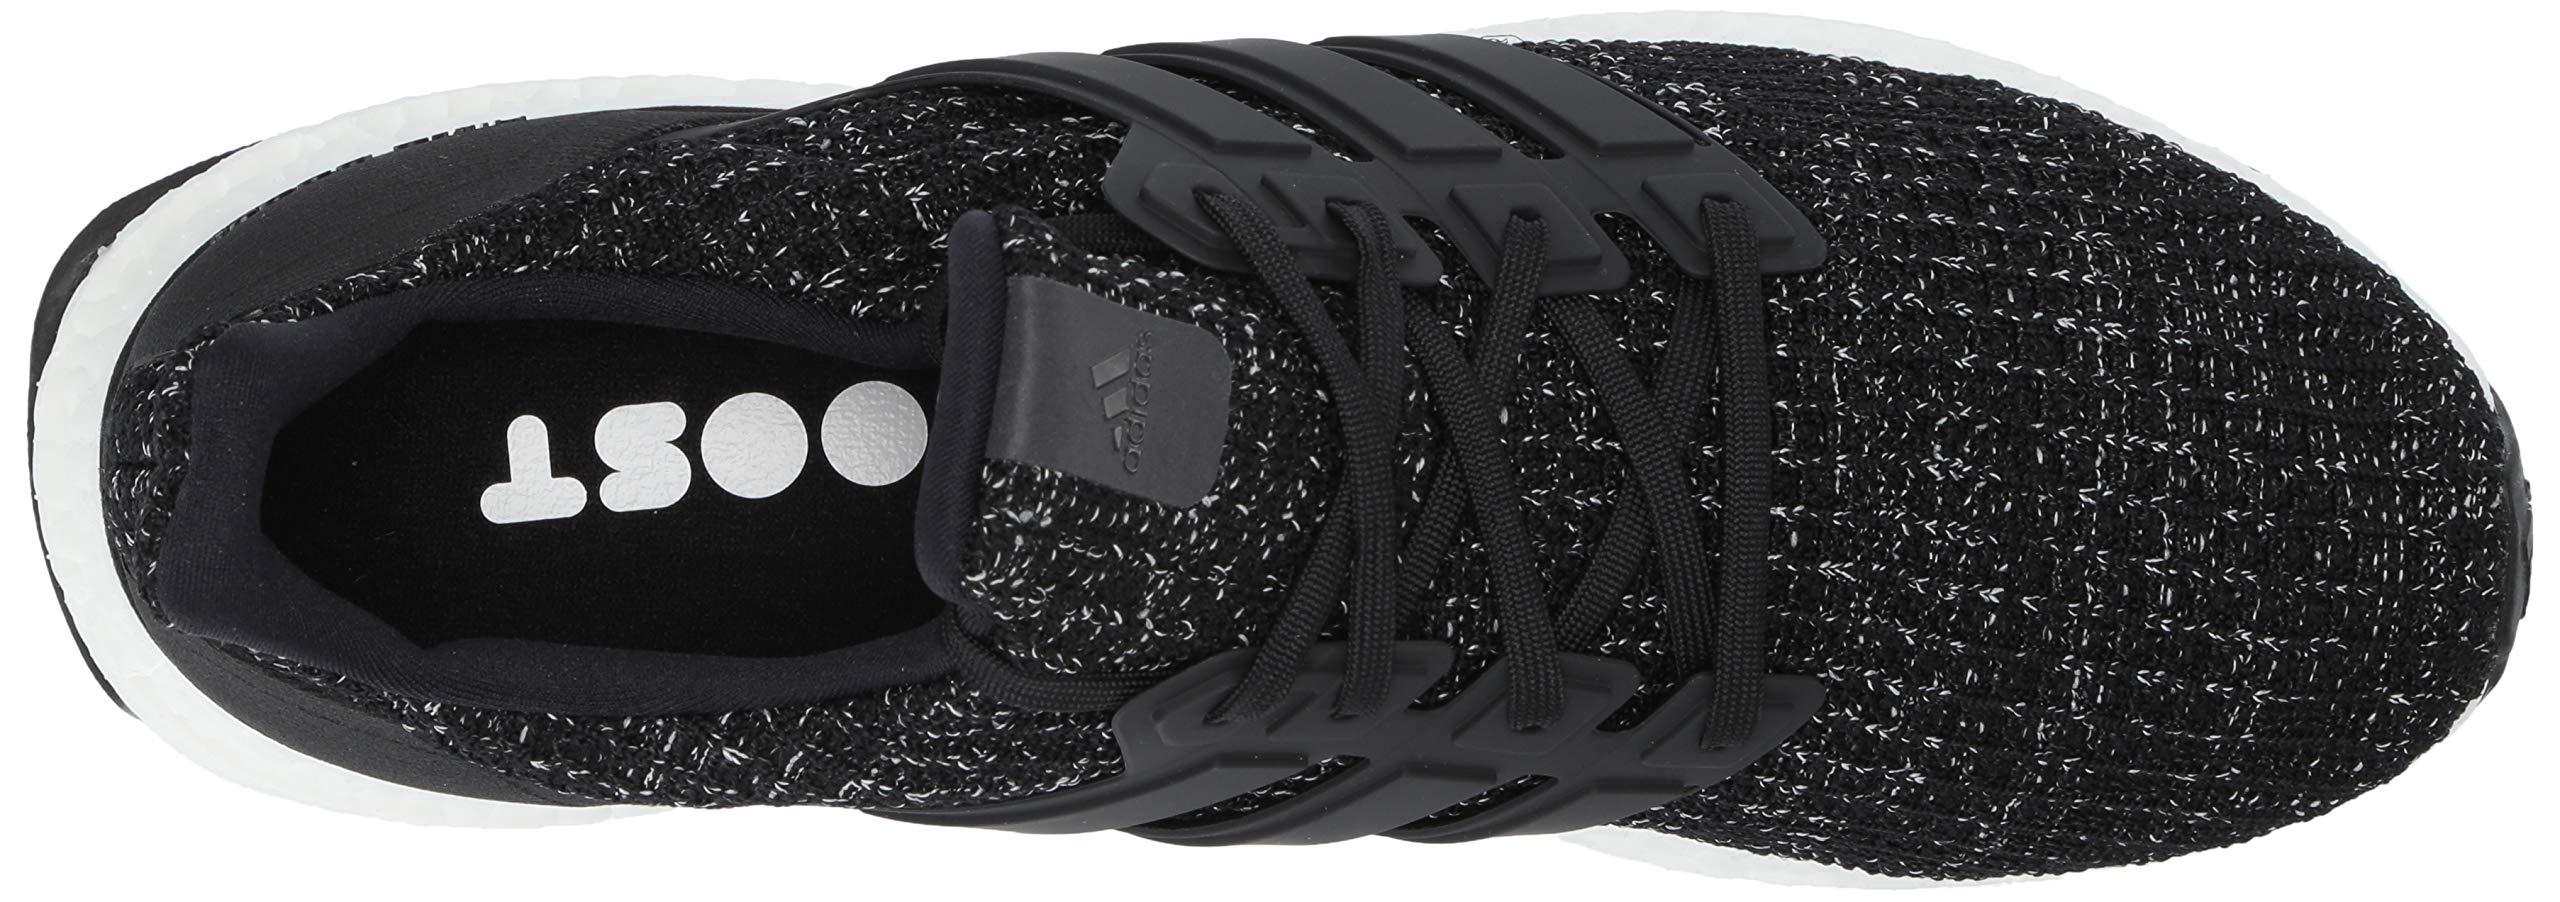 adidas Men's Ultraboost, Black/White, 9 M US by adidas (Image #11)